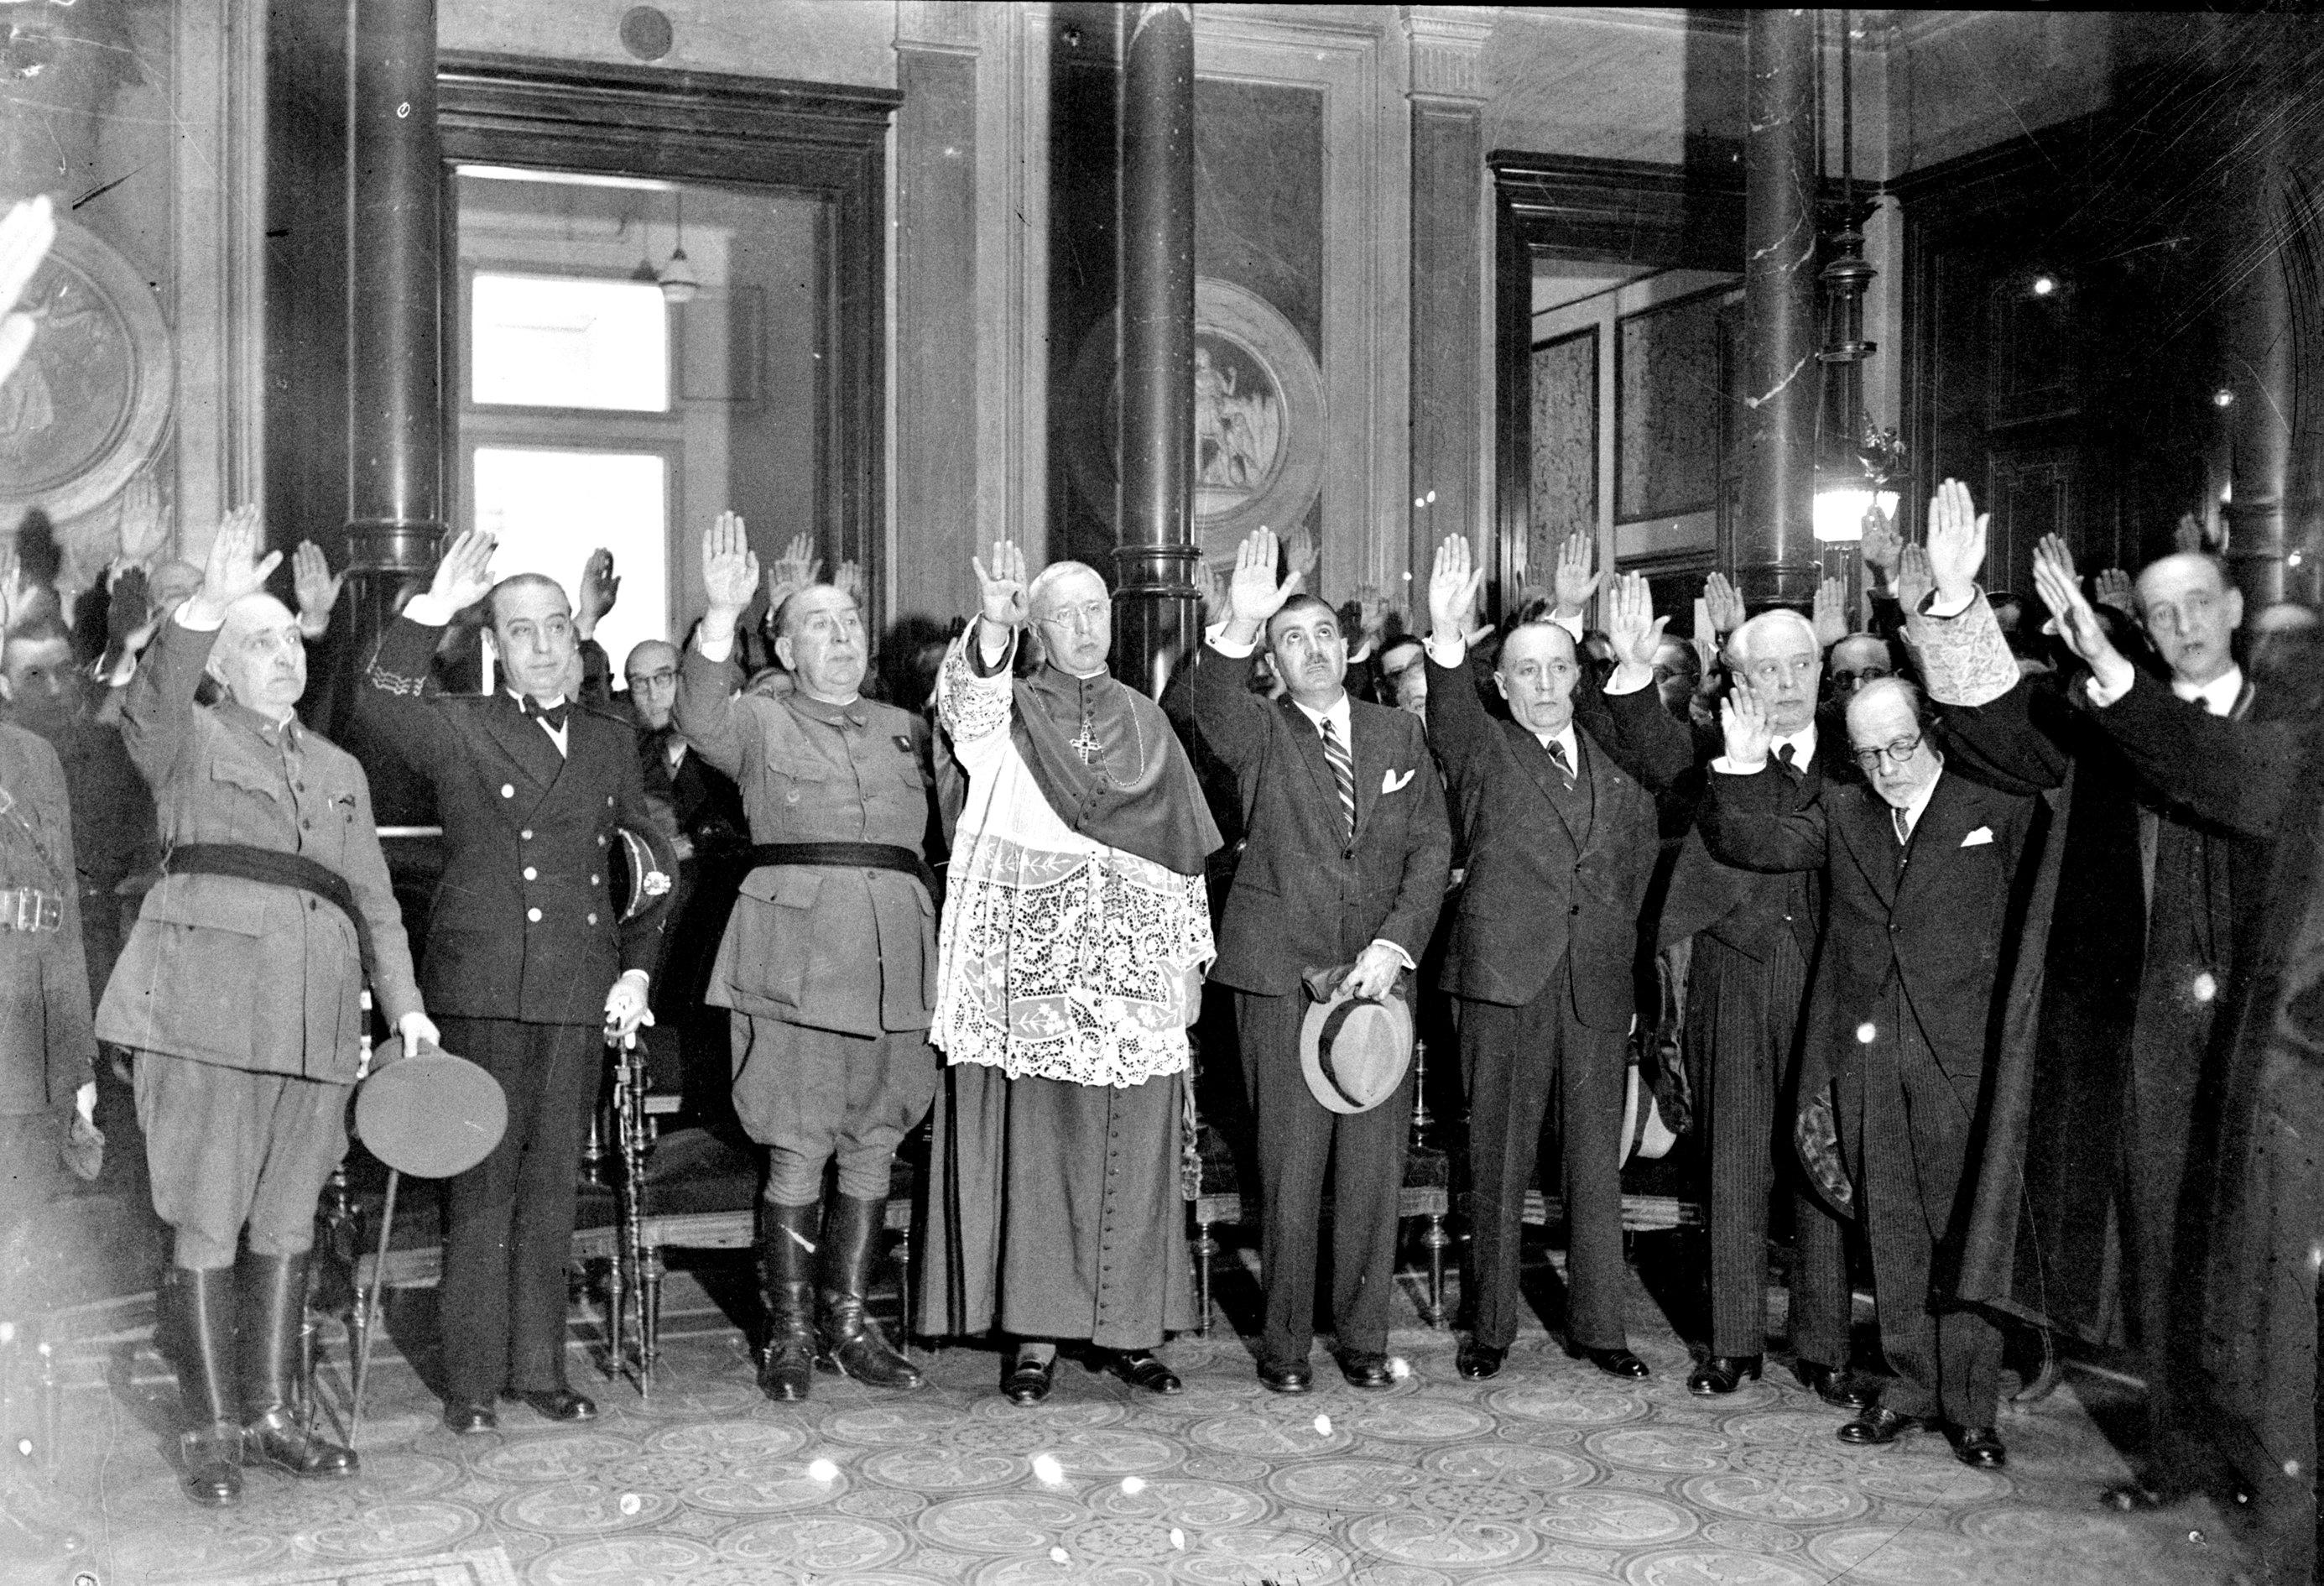 Saludo de la judicatura de Barcelona, 1940